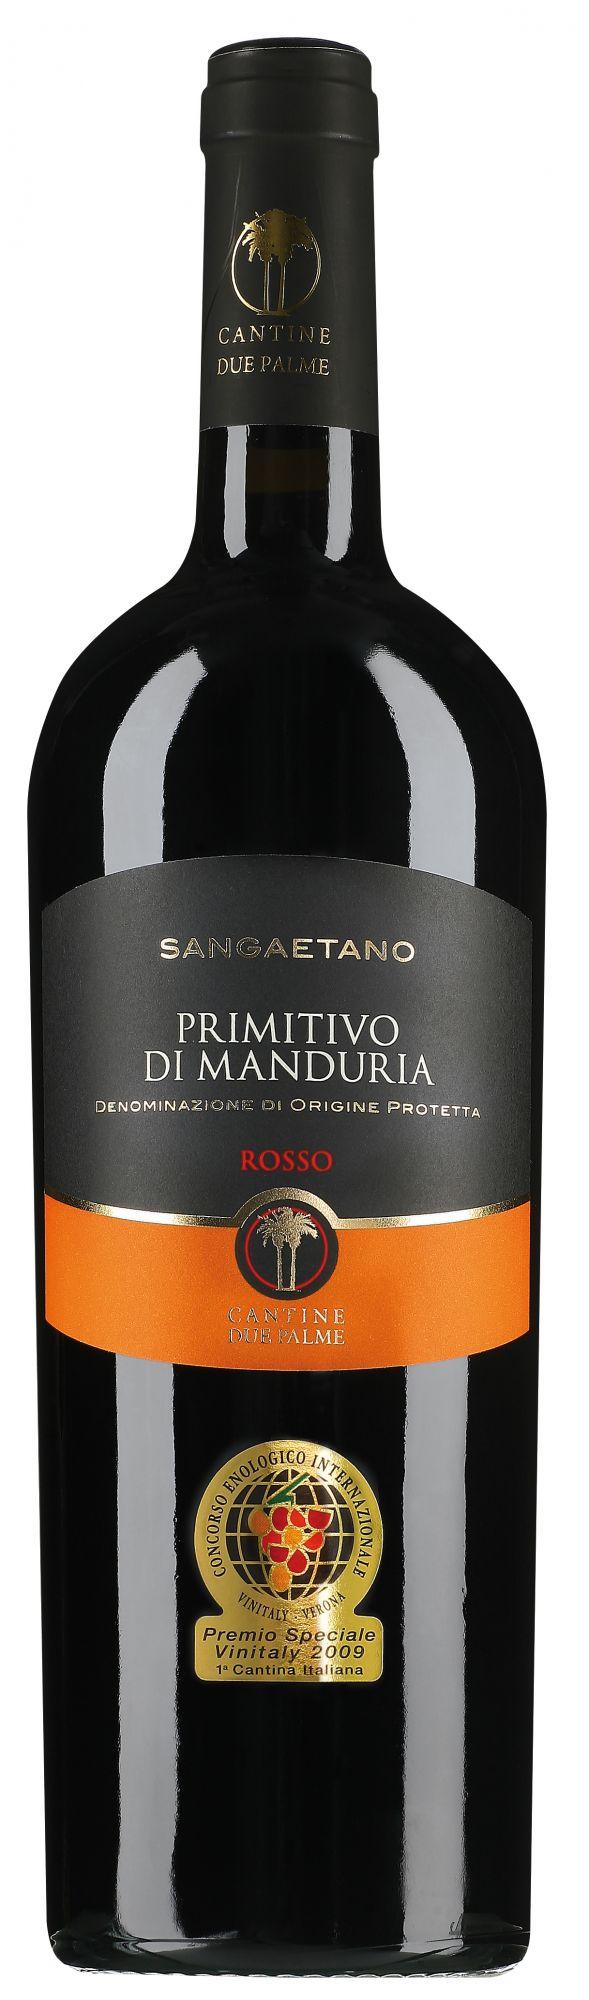 Cantine Due Palme Primitivo di Manduria Sangaetano magnum